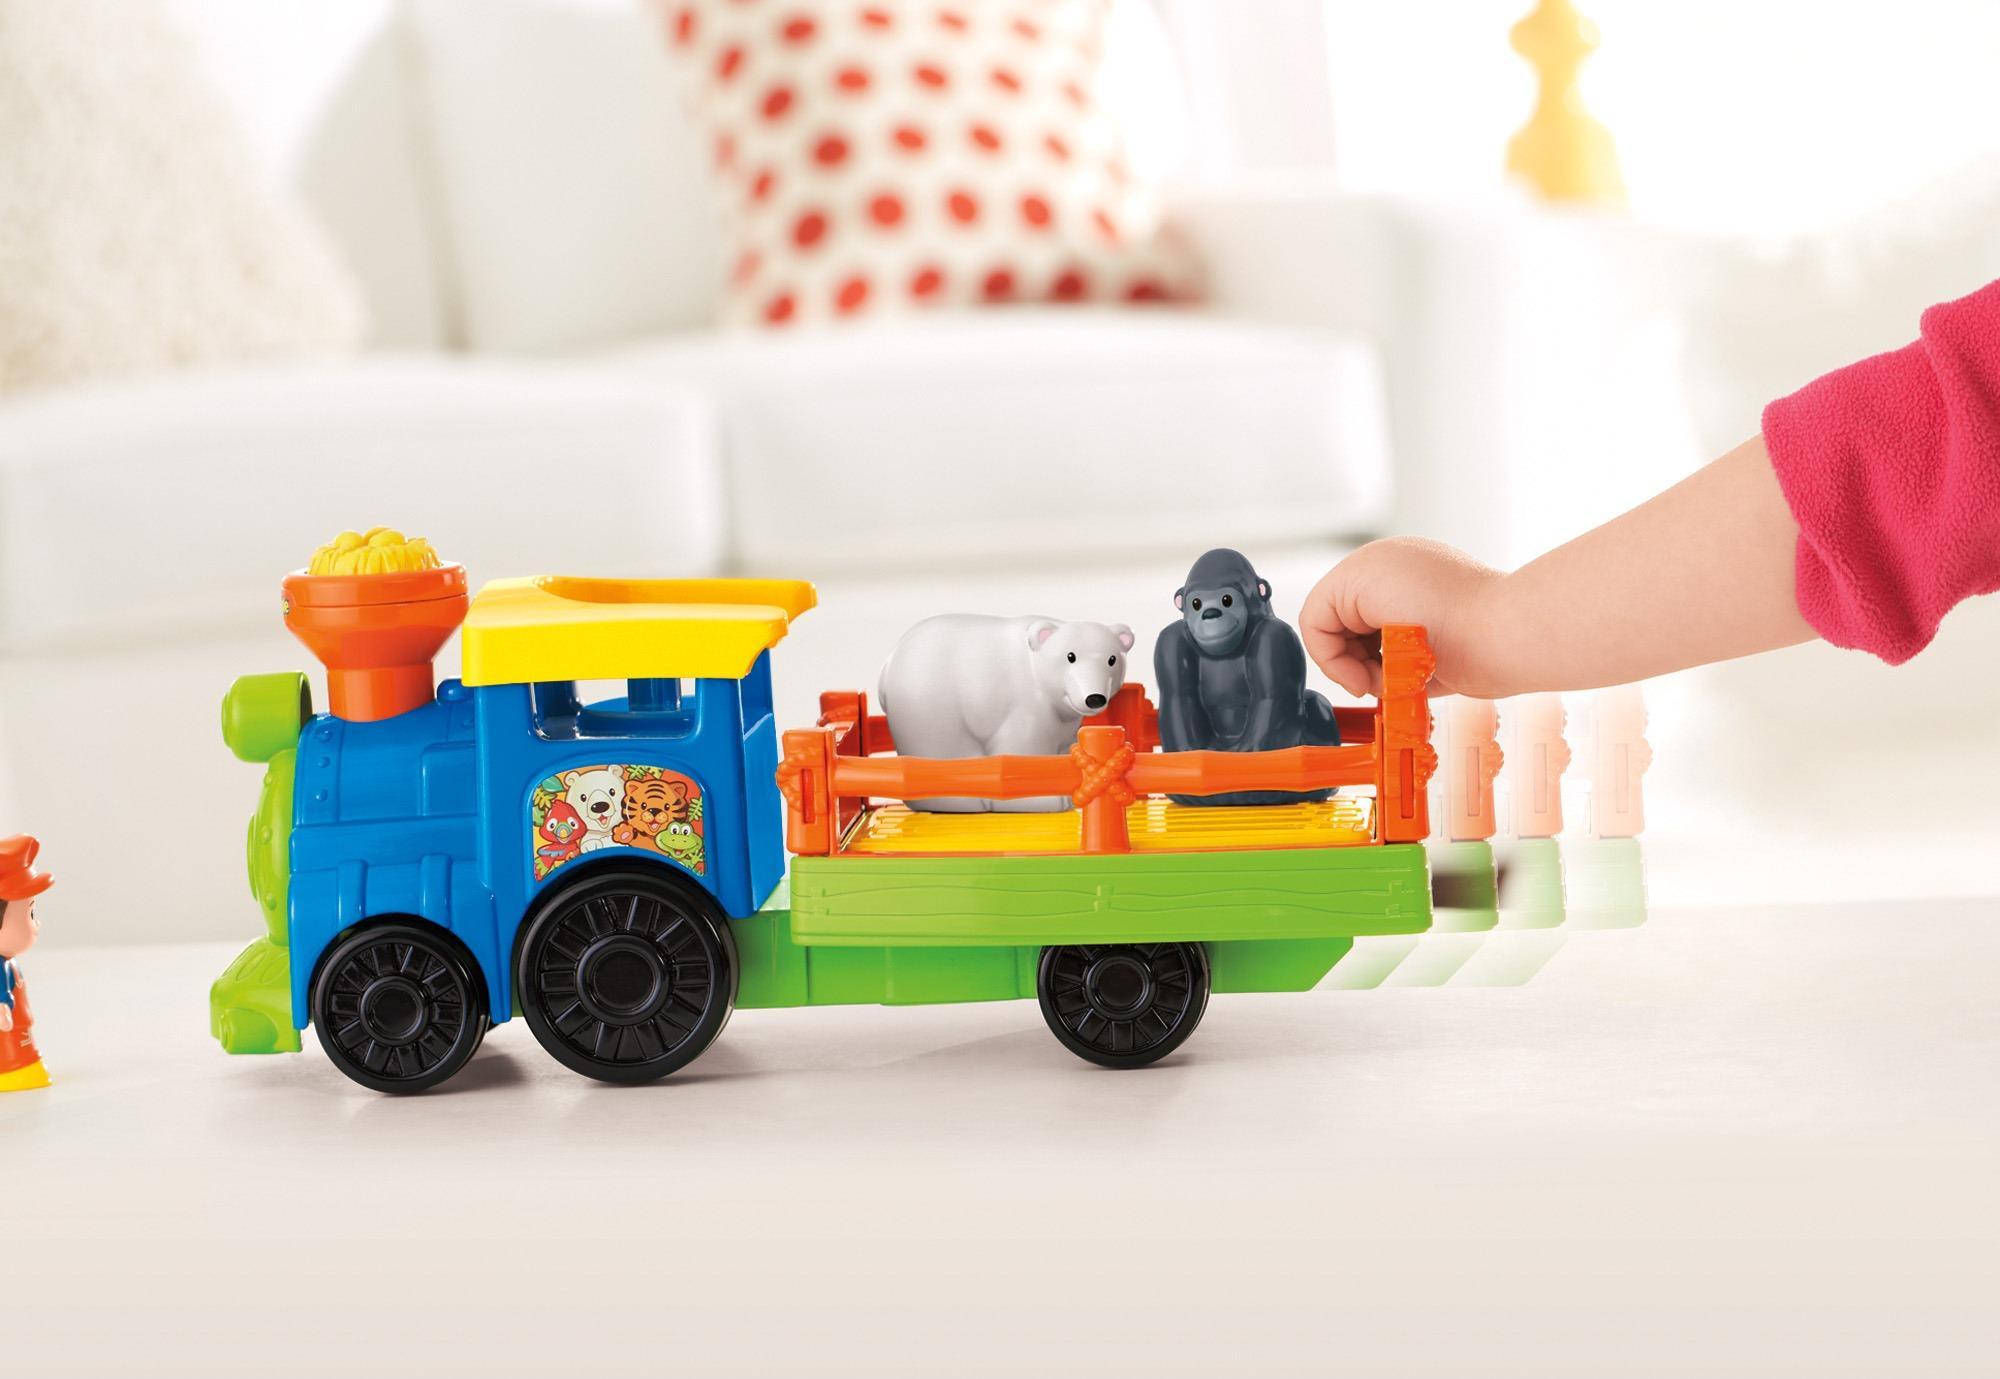 Amazon.com: Fisher-Price Little People Choo-Choo Zoo Train: Toys & Games